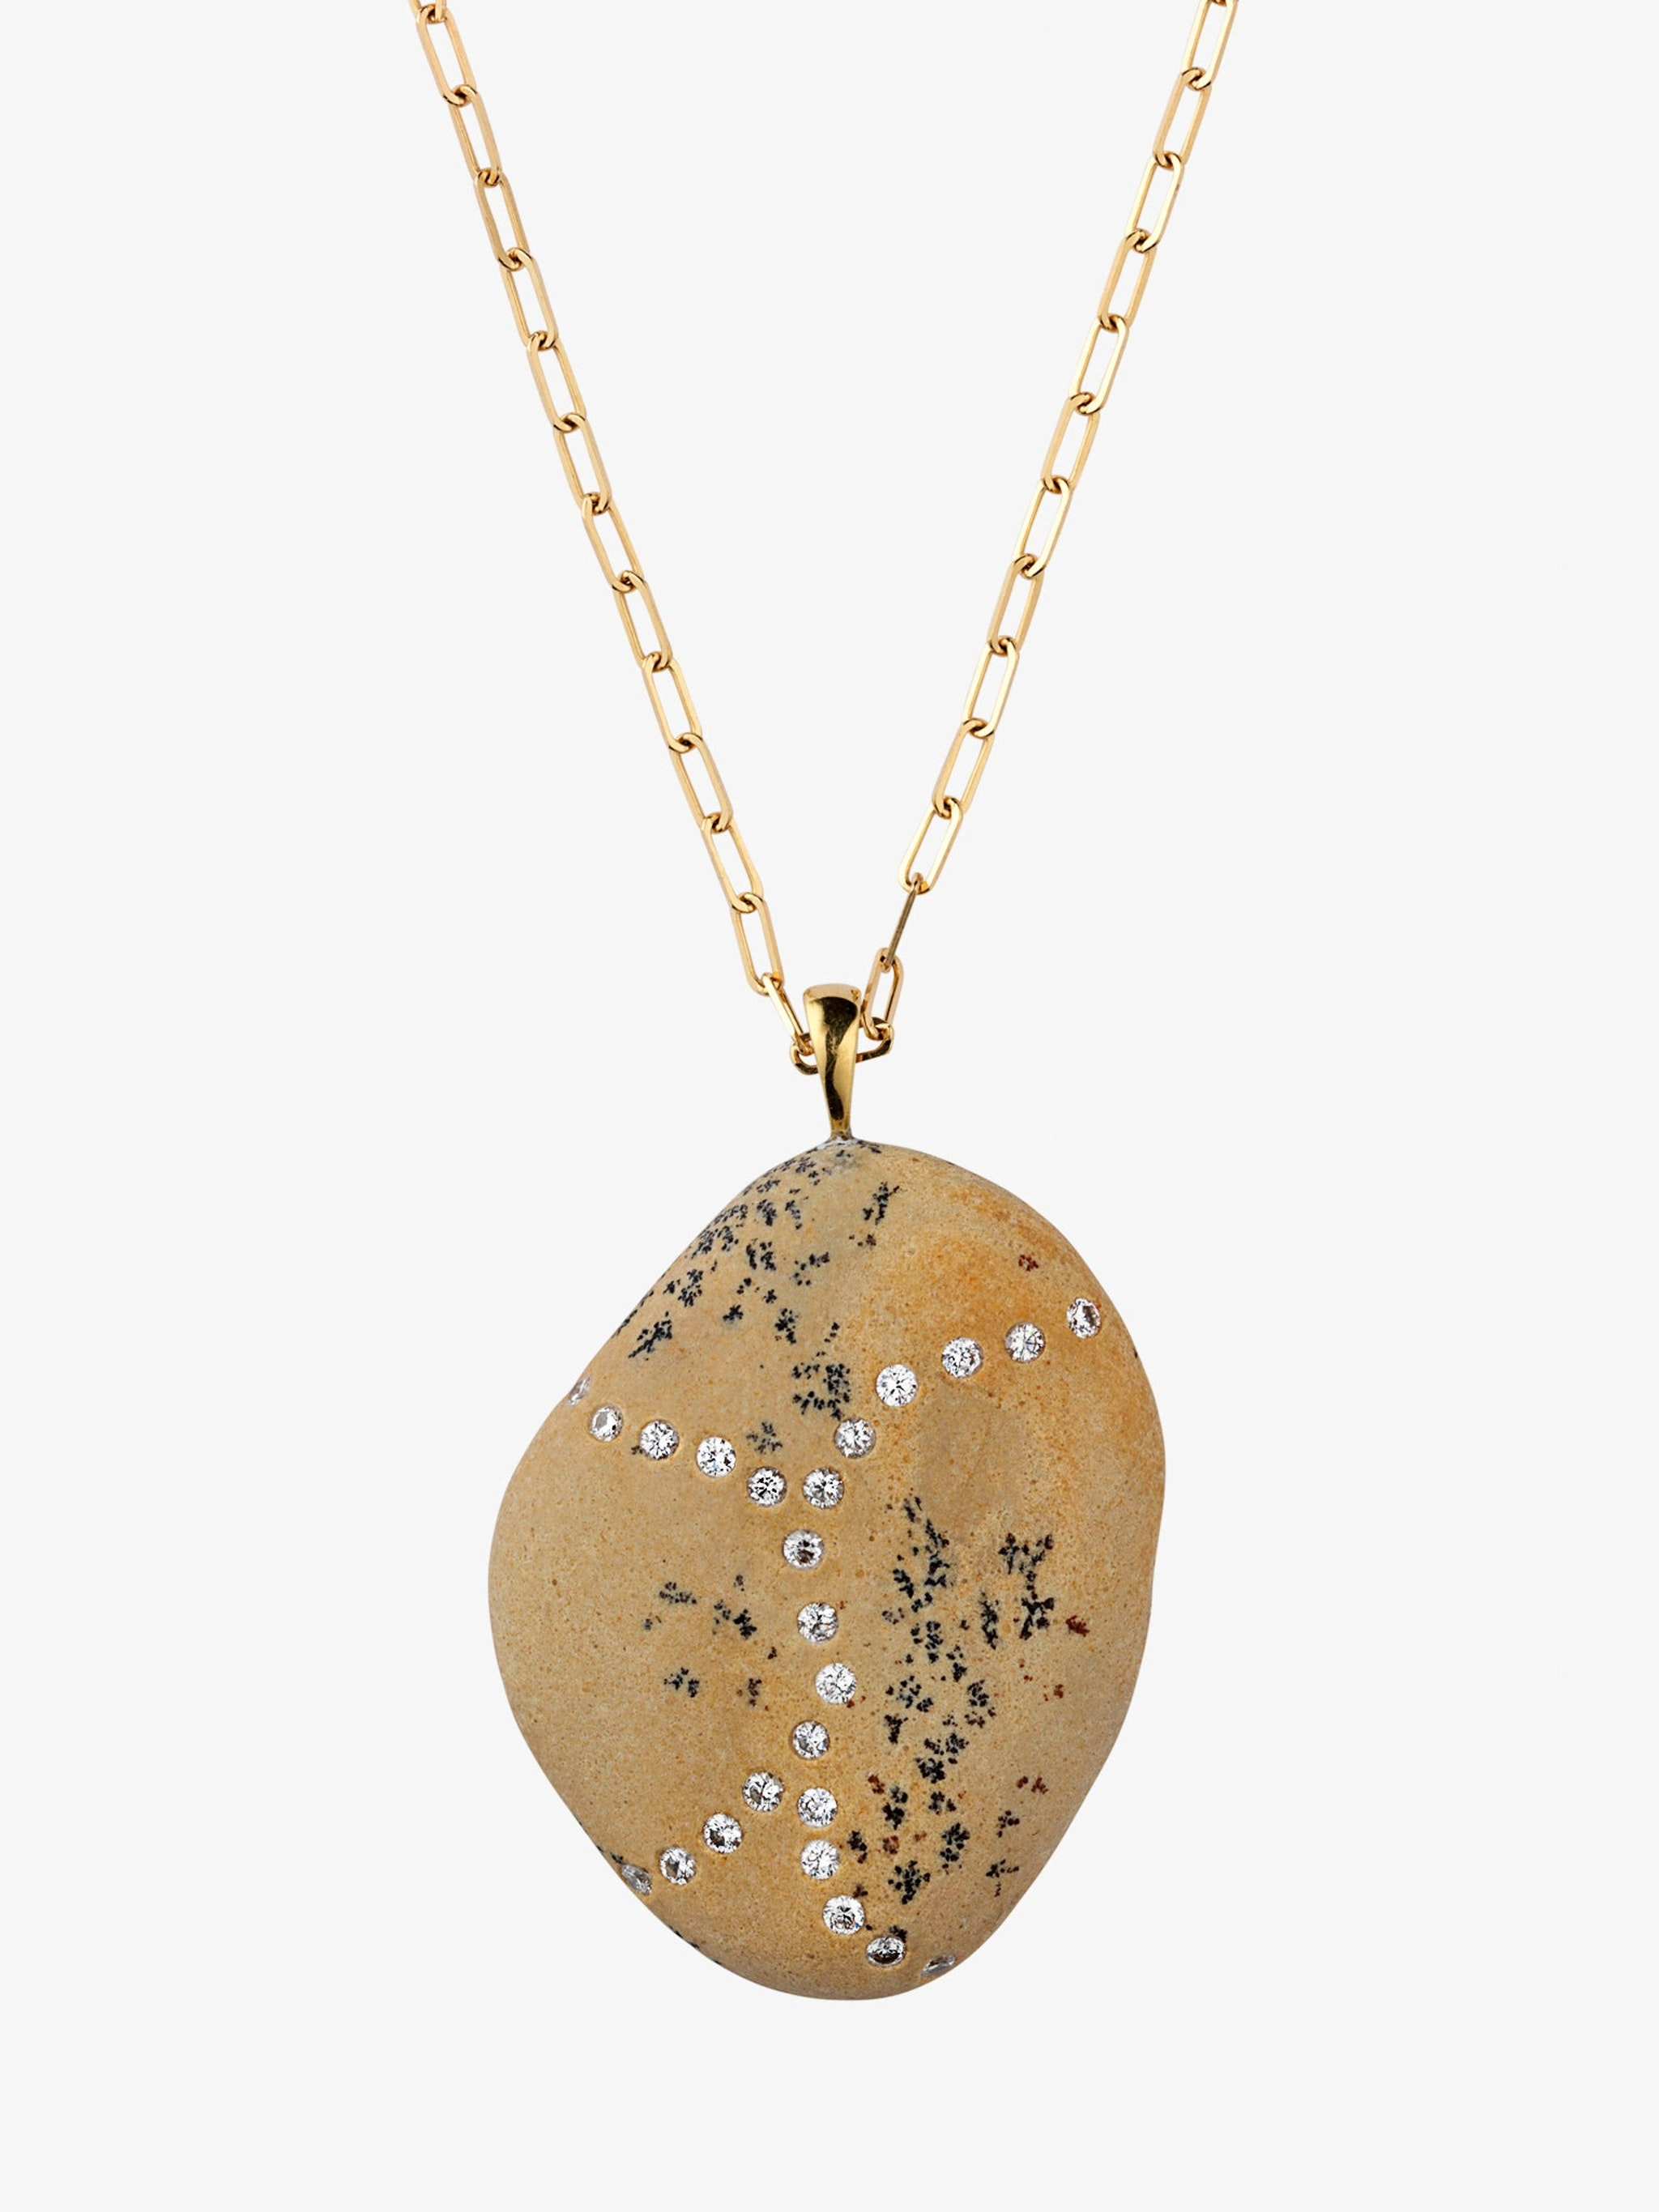 Surge gold, stone and diamond necklace photo 3